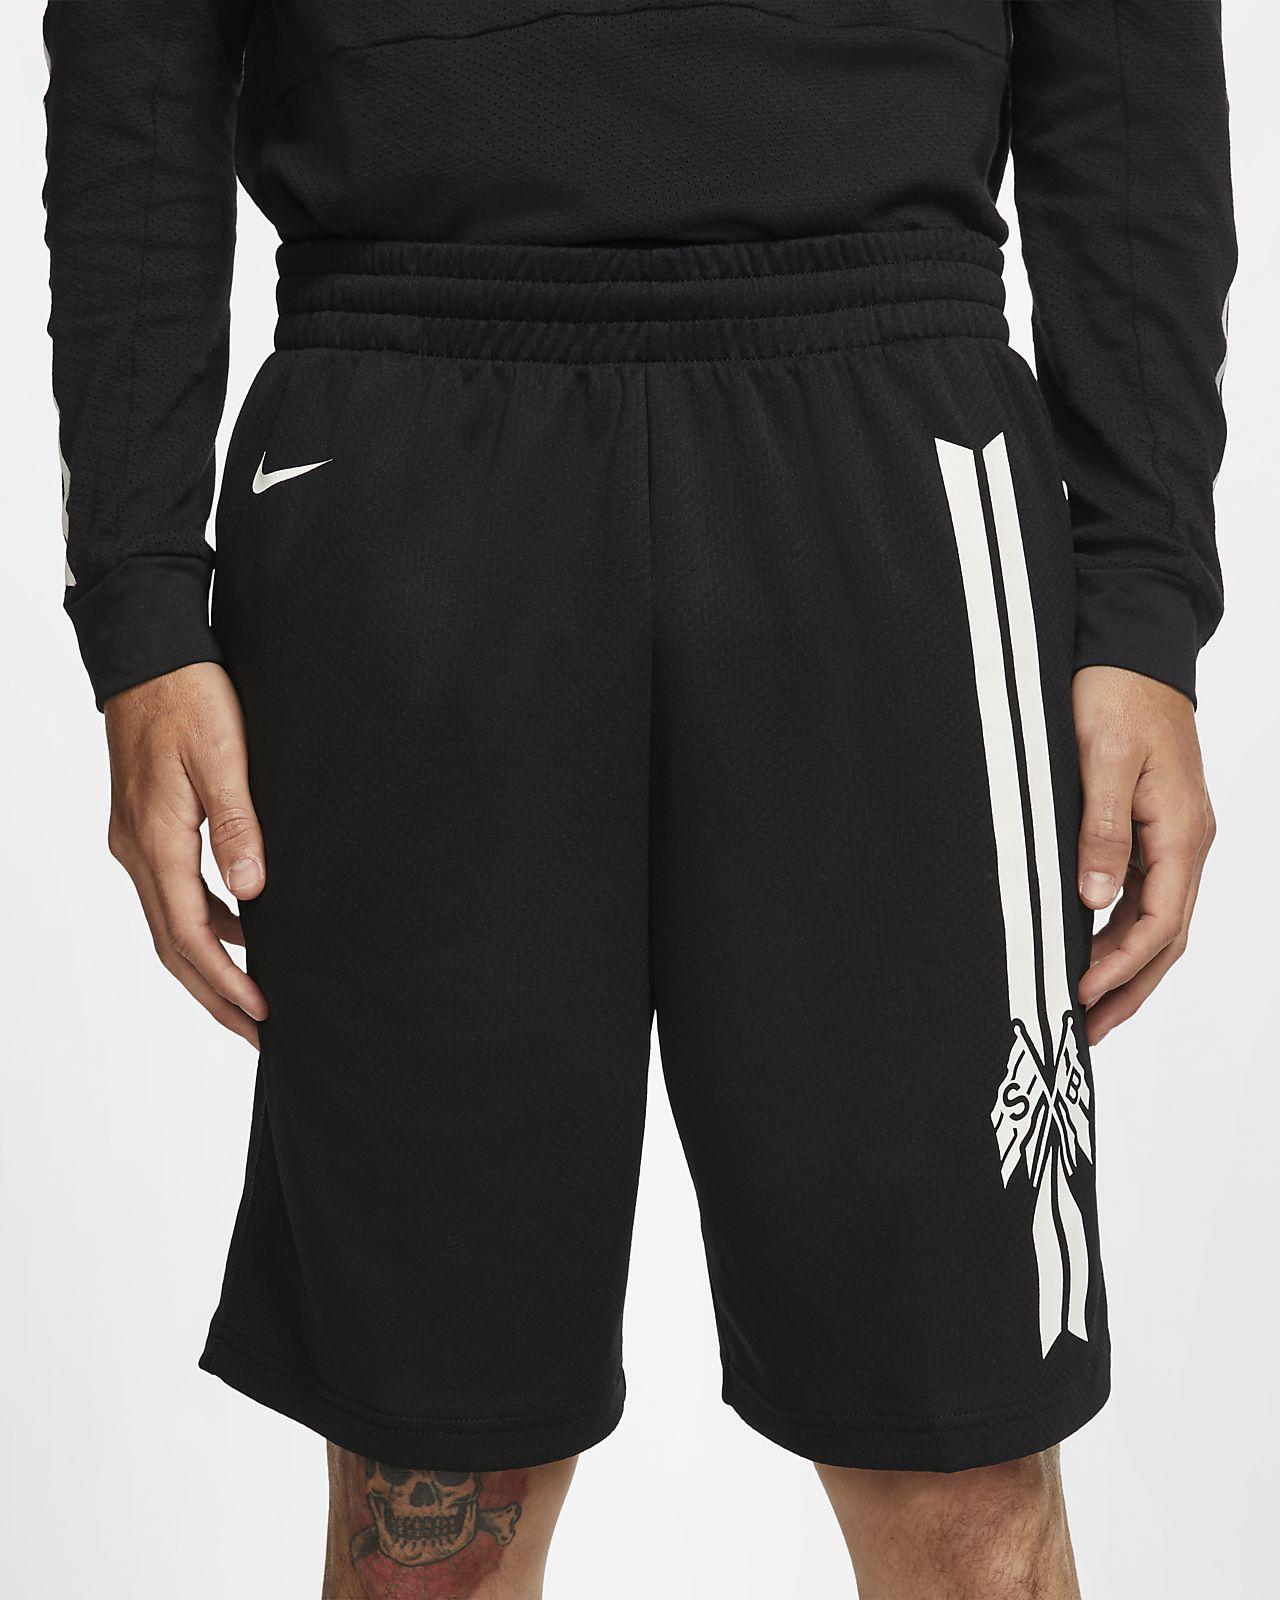 Shorts de skate con estampado para hombre Nike SB Dri-FIT Sunday